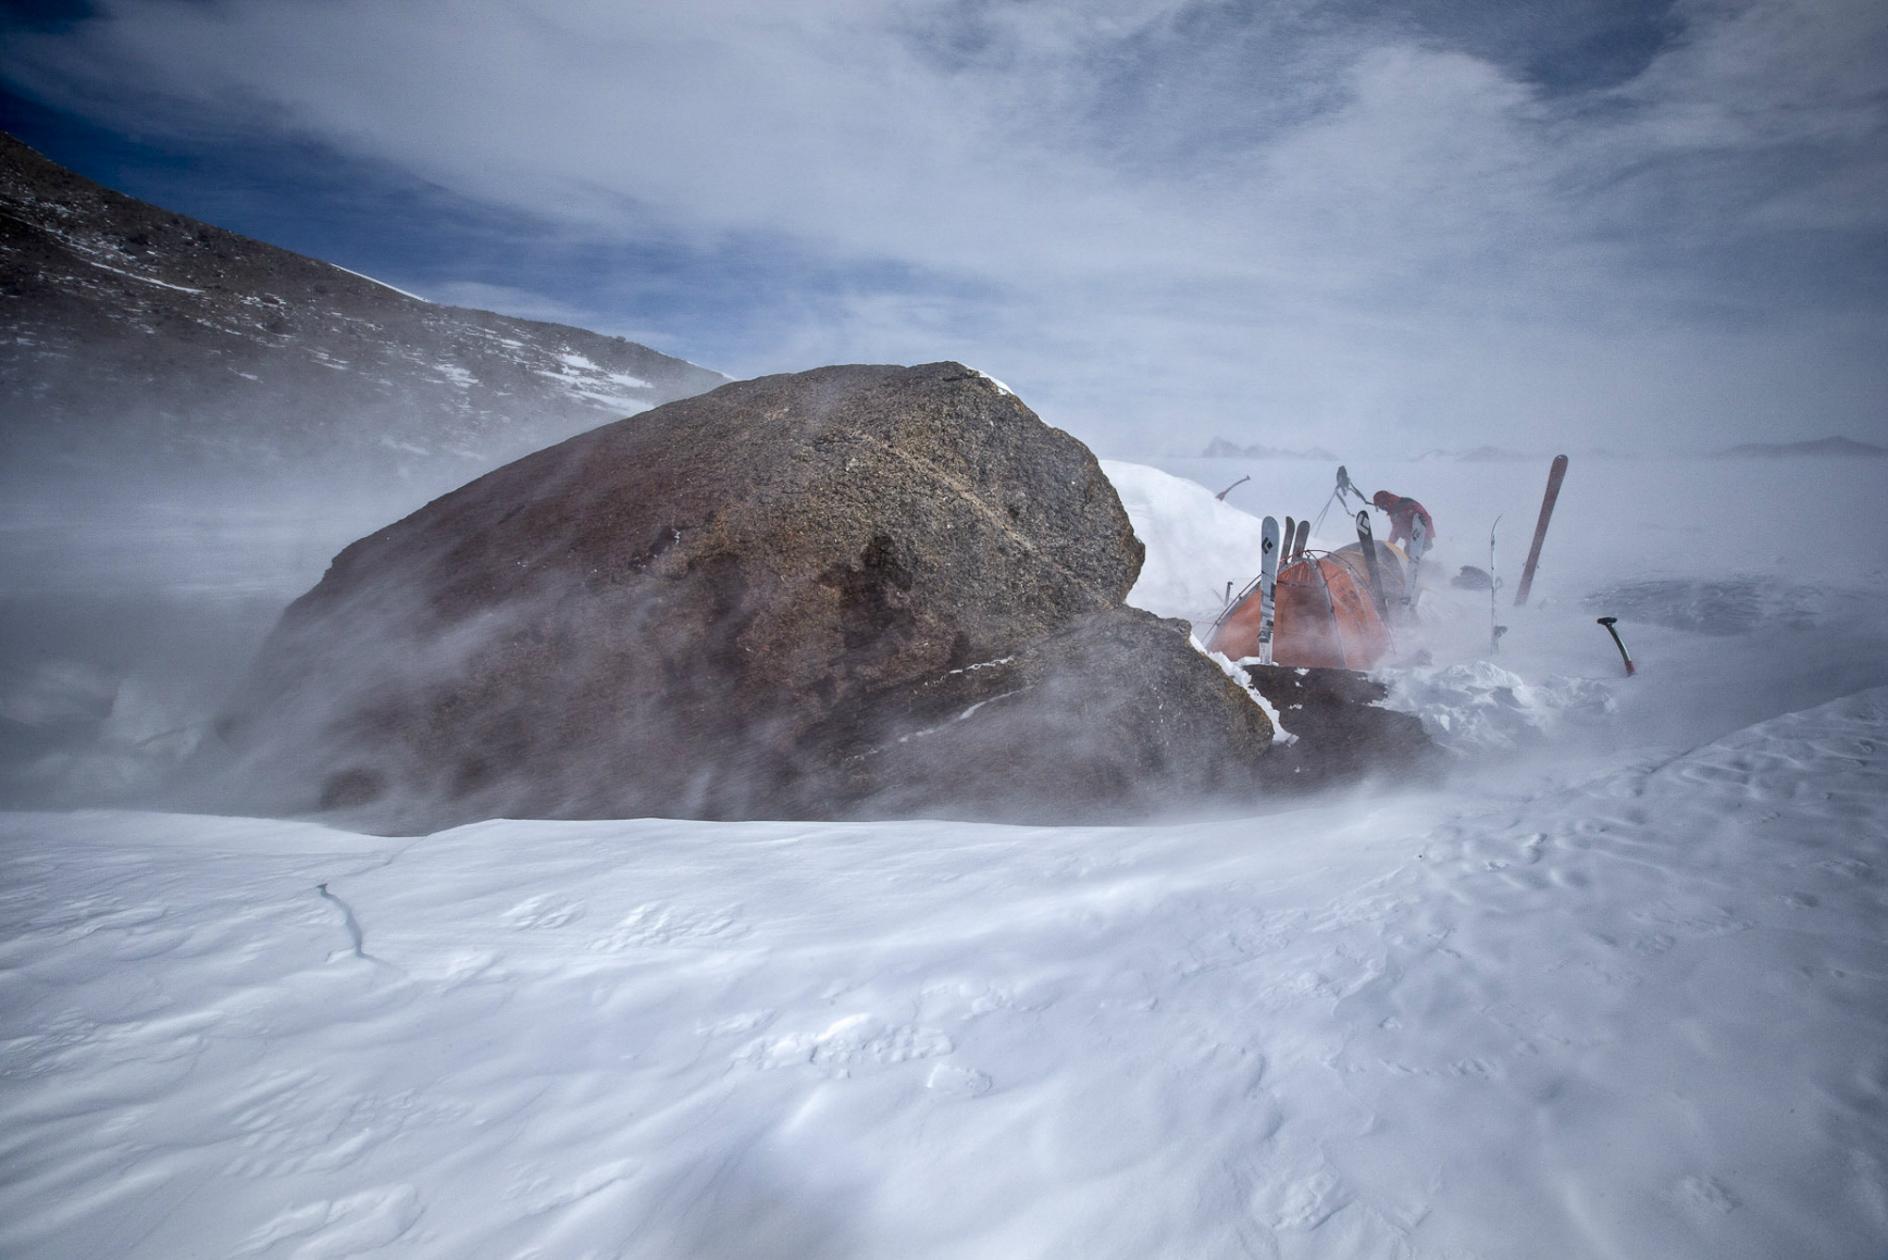 Cory-Richards-Photographer-Antarctica-5.jpg